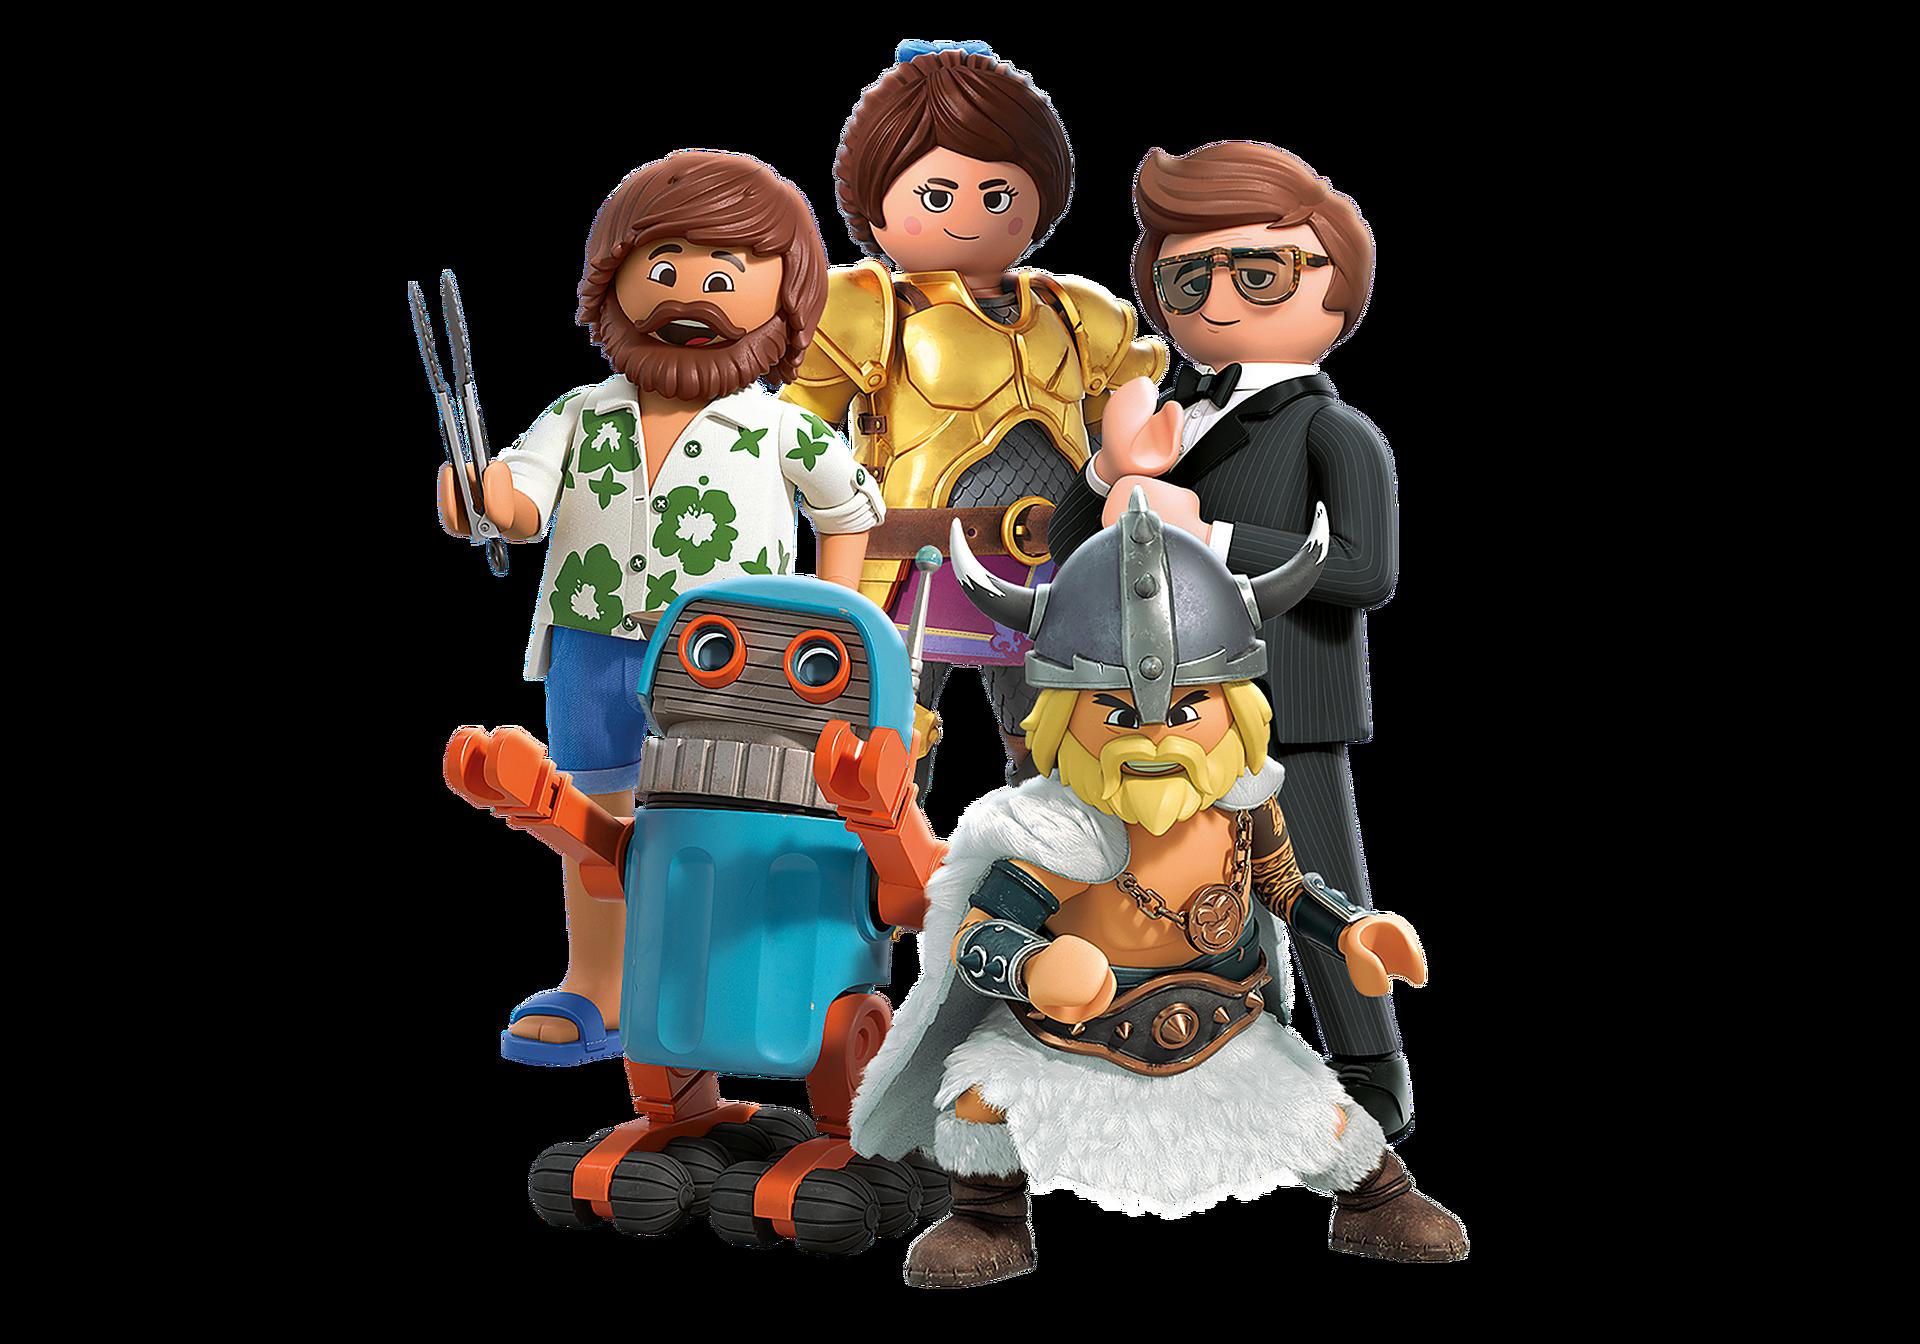 http://media.playmobil.com/i/playmobil/70069_product_detail/PLAYMOBIL: THE MOVIE - Figures (1. edycja)